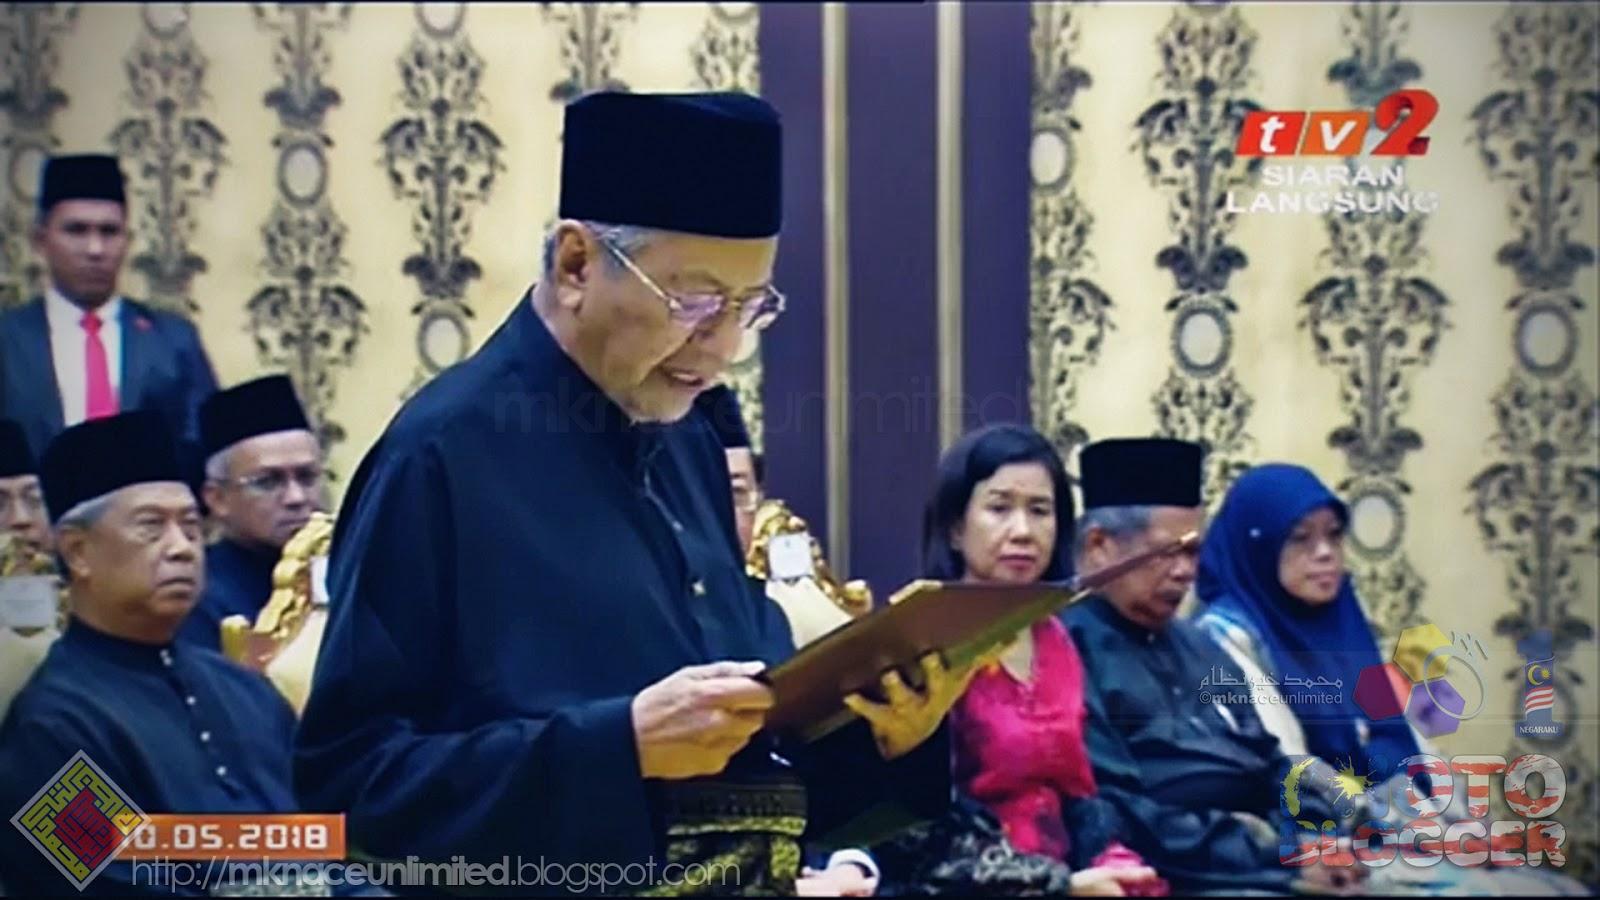 Tun Dr Mahathir Angkat Sumpah Perdana Menteri Malaysia Ketujuh Tcash Vaganza 32 Milo Activ Go Mknace Unlimited The Colours Of Life